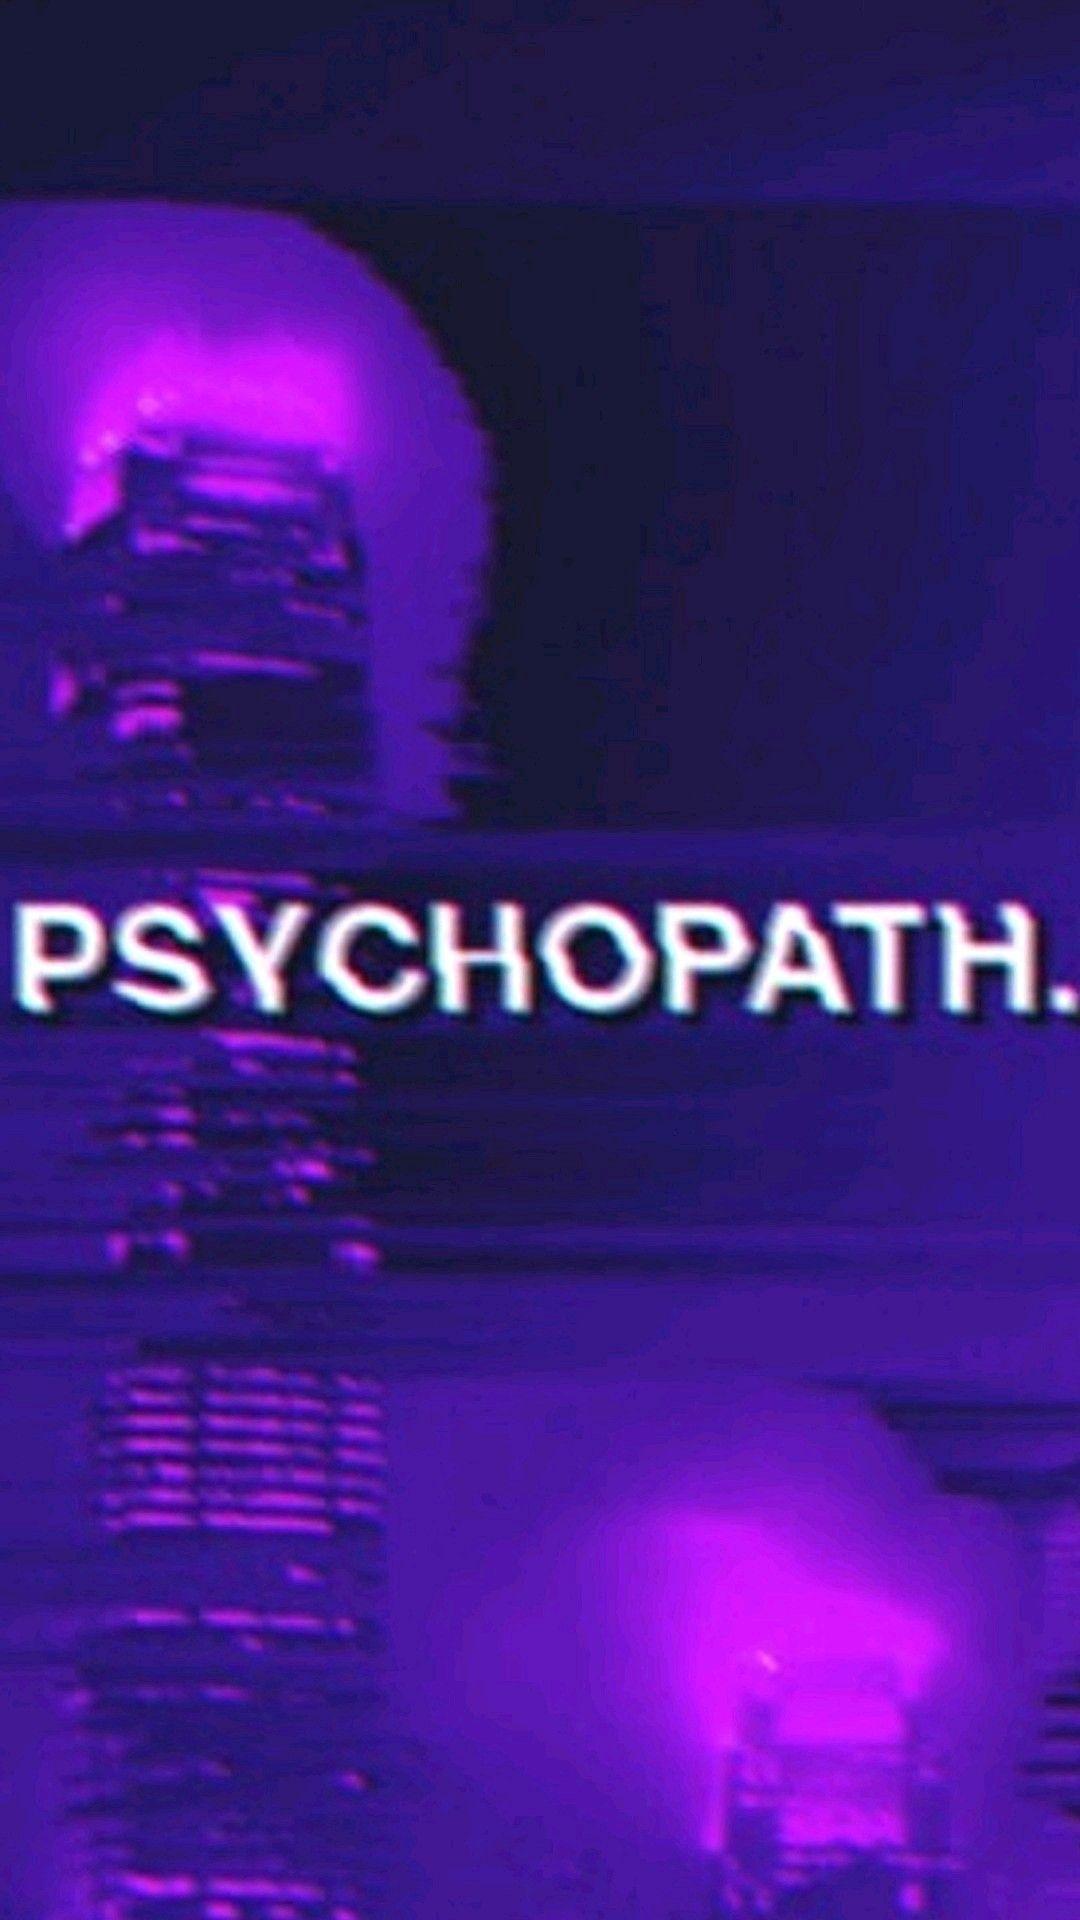 Neon Edgy Purple Aesthetic Wallpaper